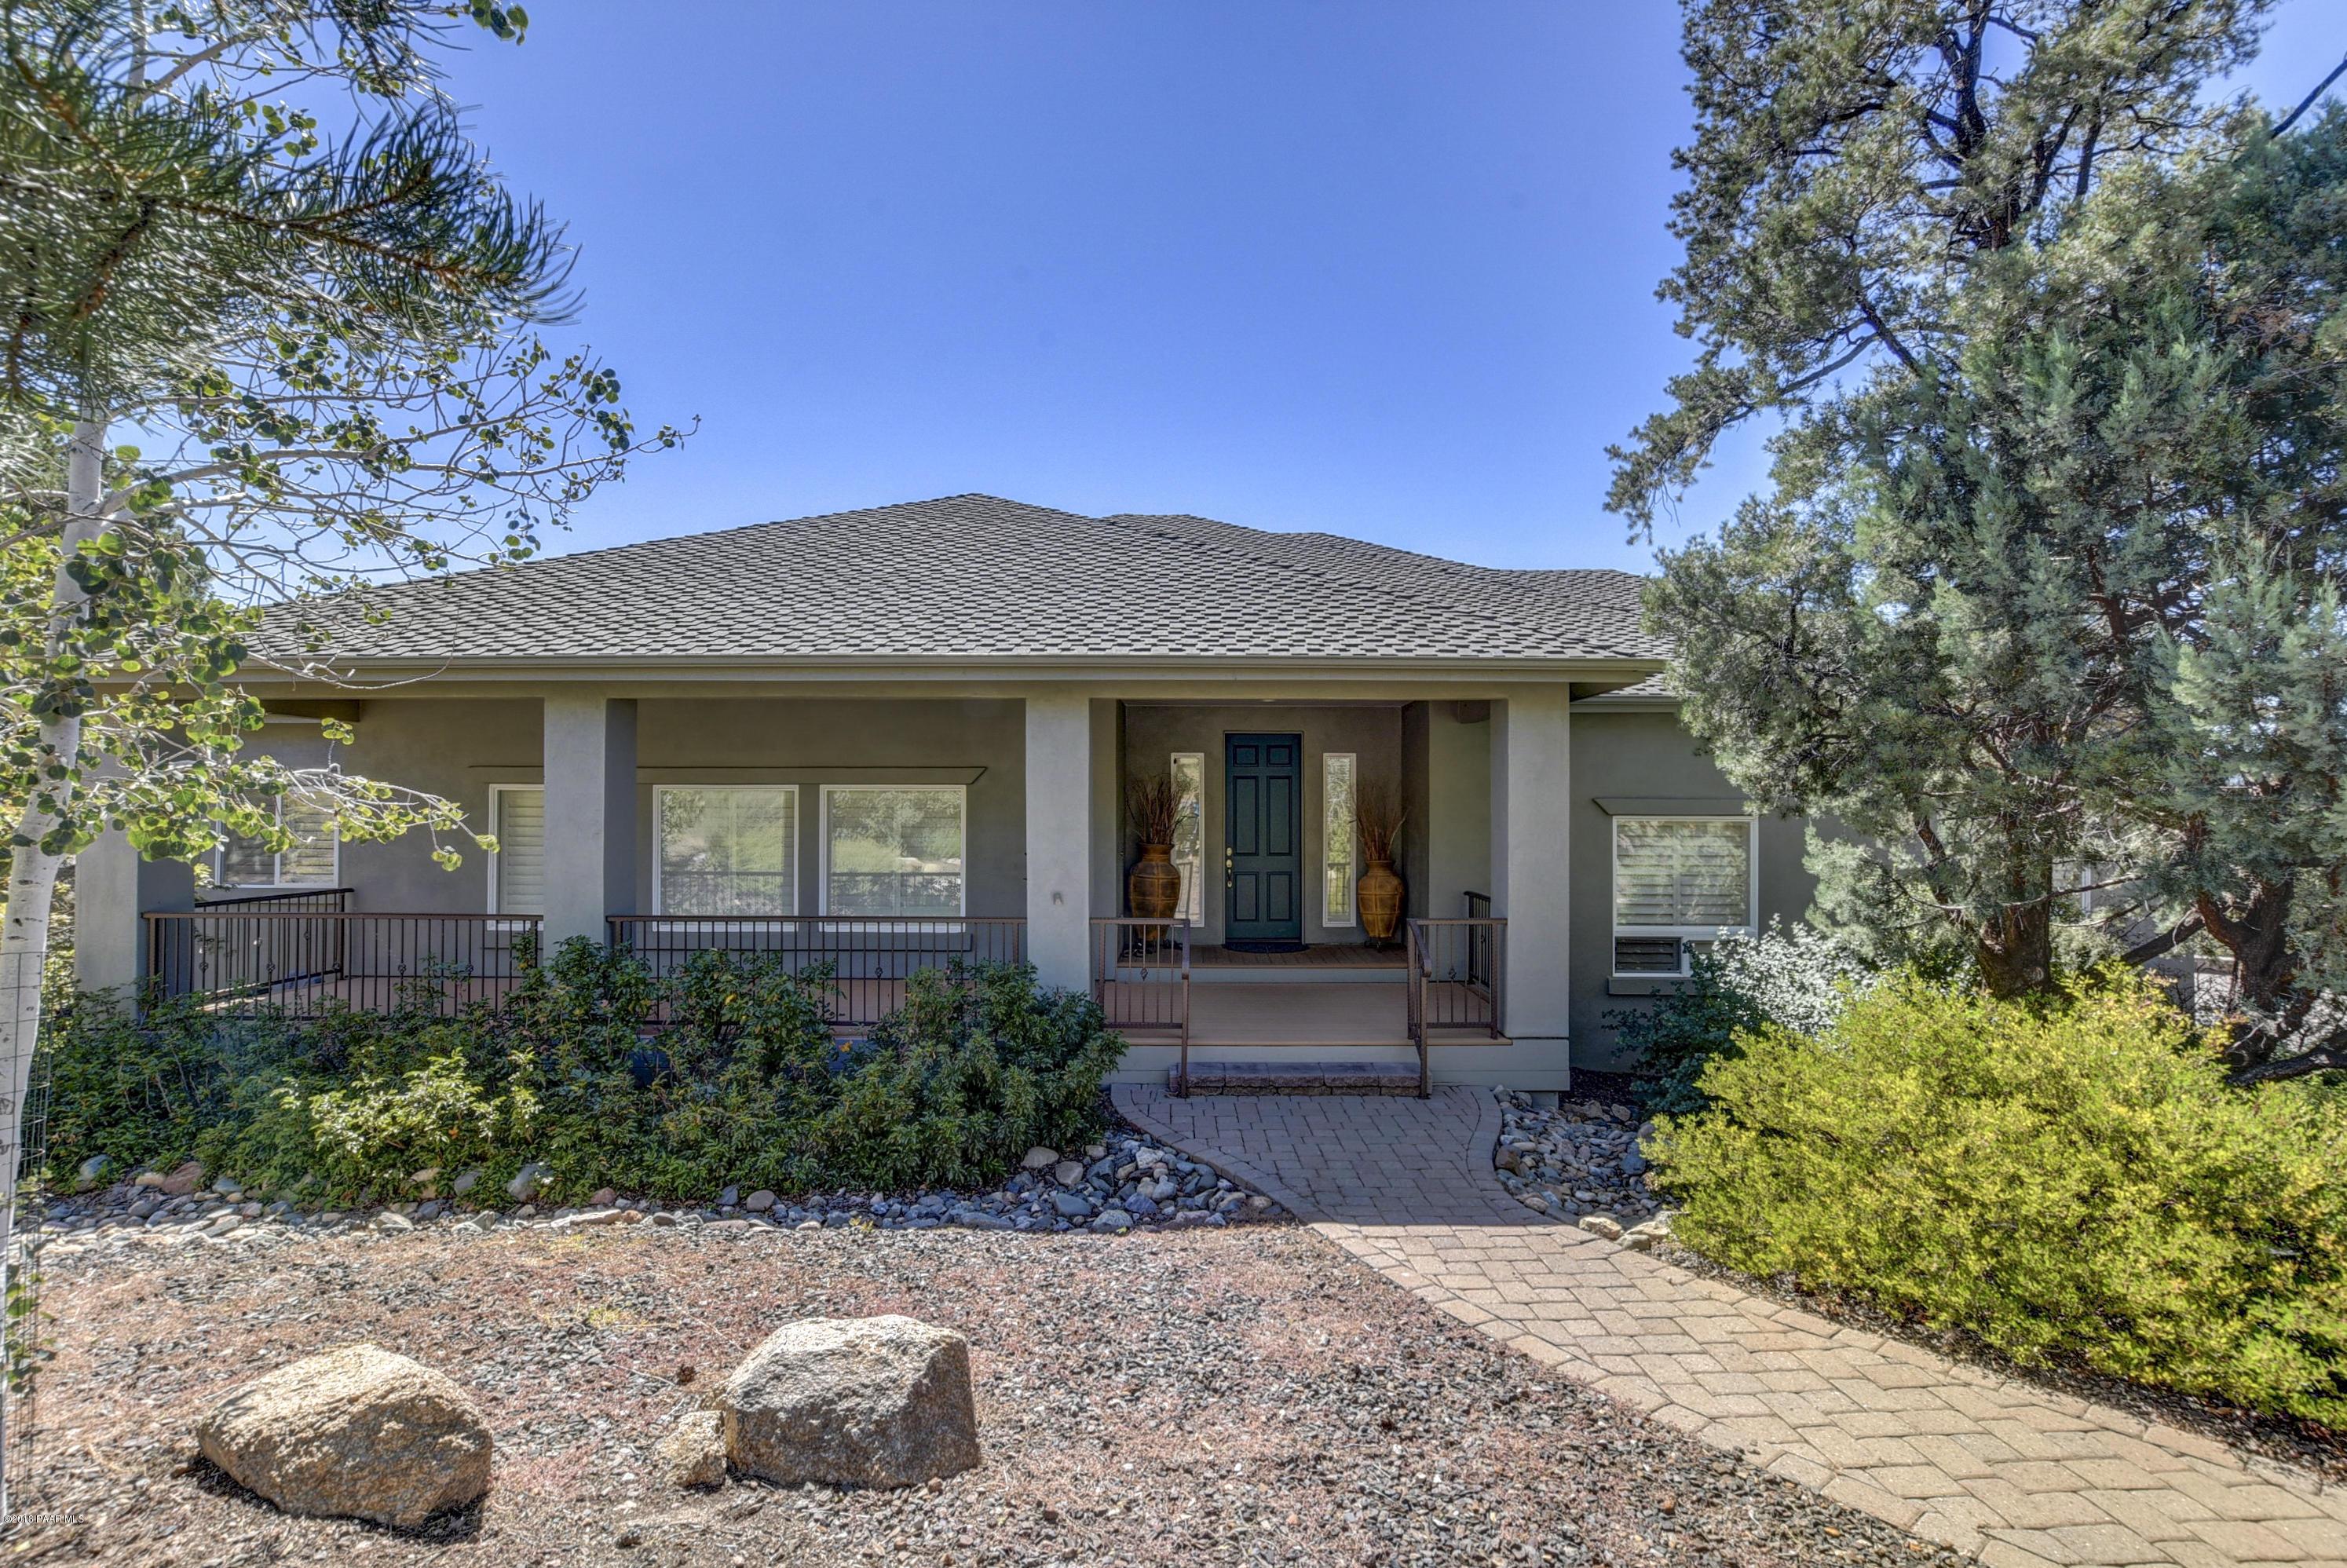 Photo of 1527 Southview, Prescott, AZ 86305